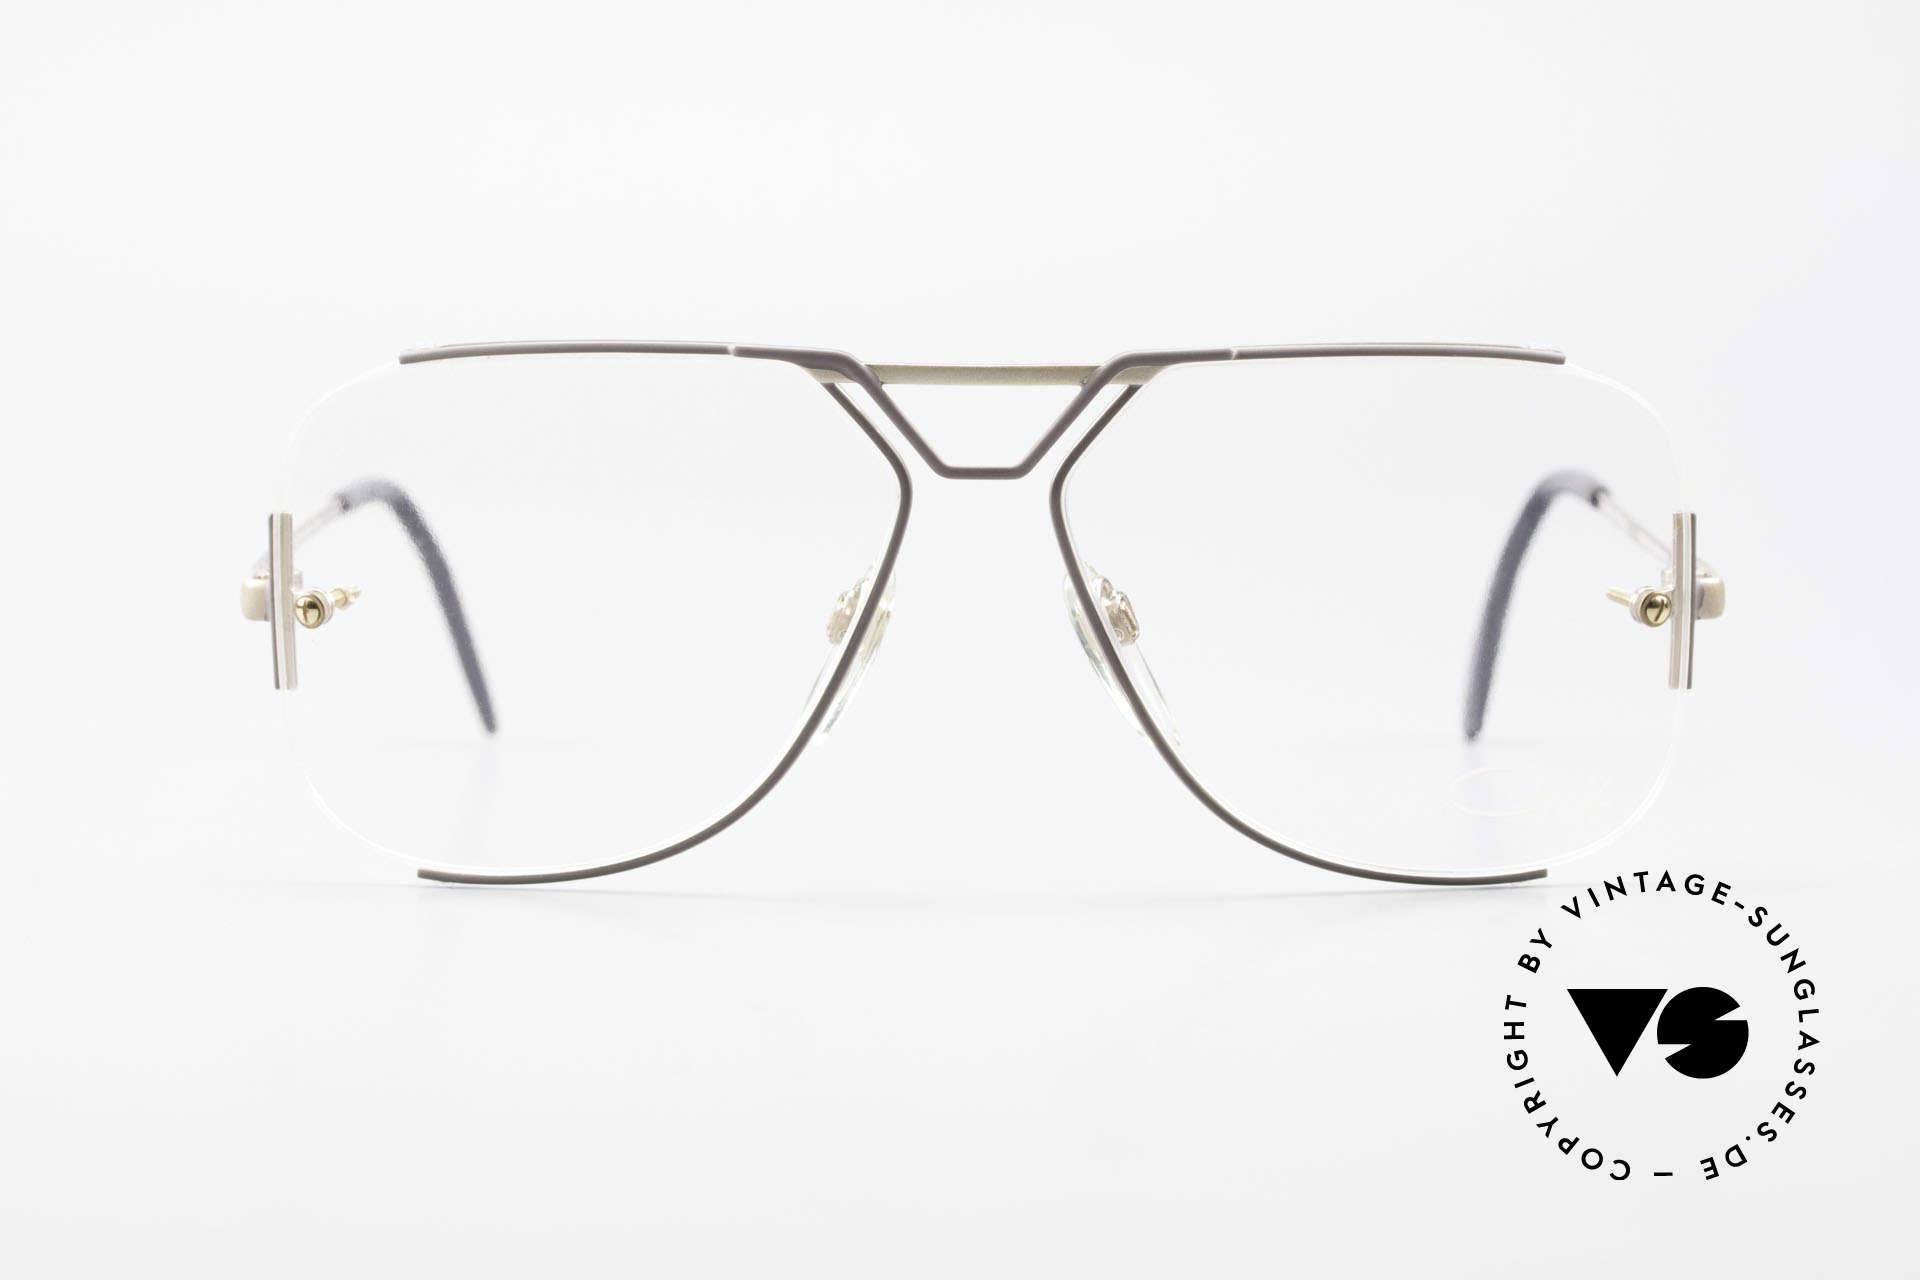 Cazal 722 Extraordinary Vintage Frame, very special frame construction; semi-rimless, Made for Men